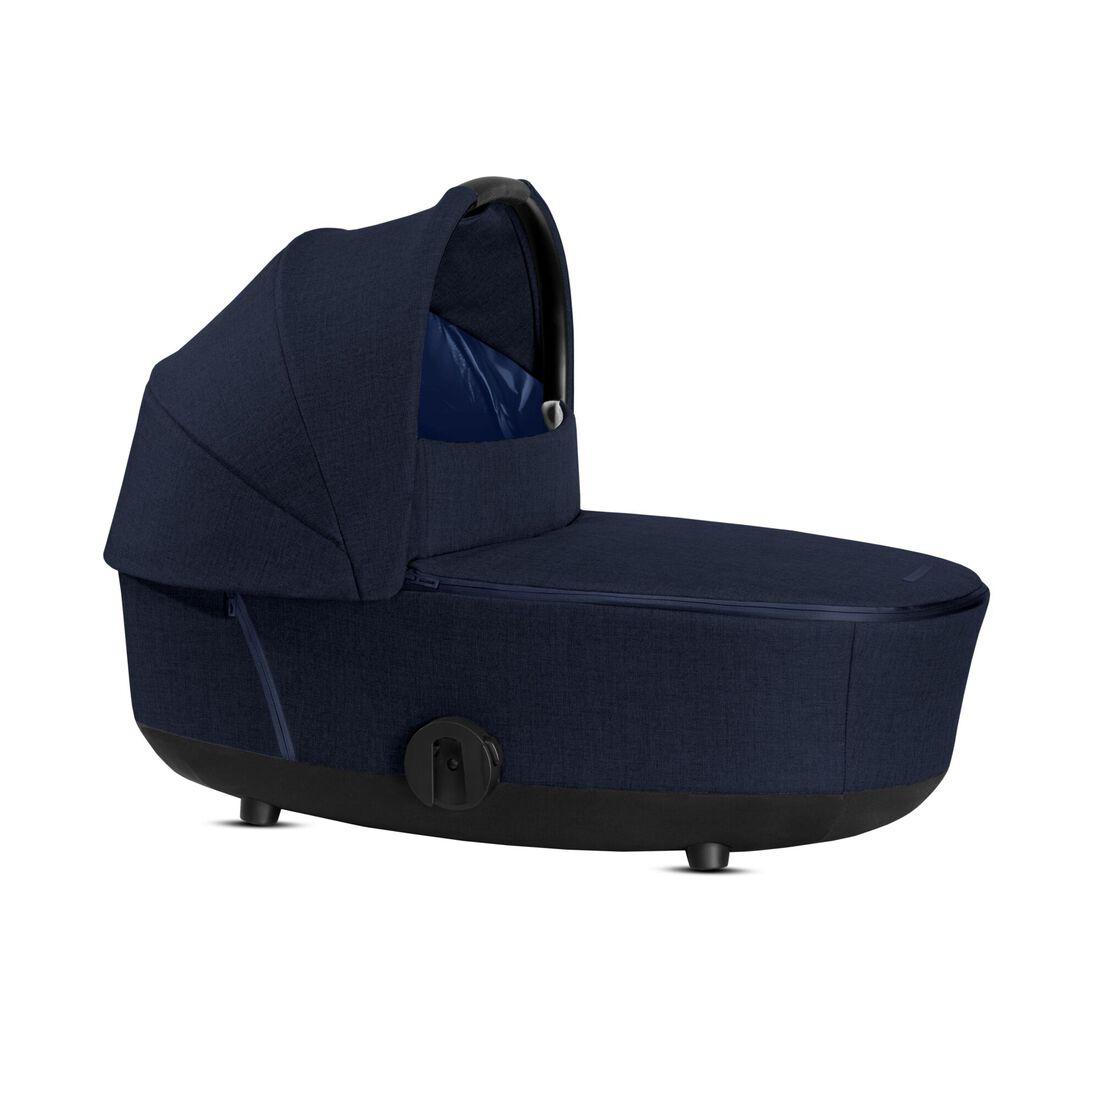 CYBEX Mios Lux Carry Cot - Midnight Blue Plus in Midnight Blue Plus large Bild 1